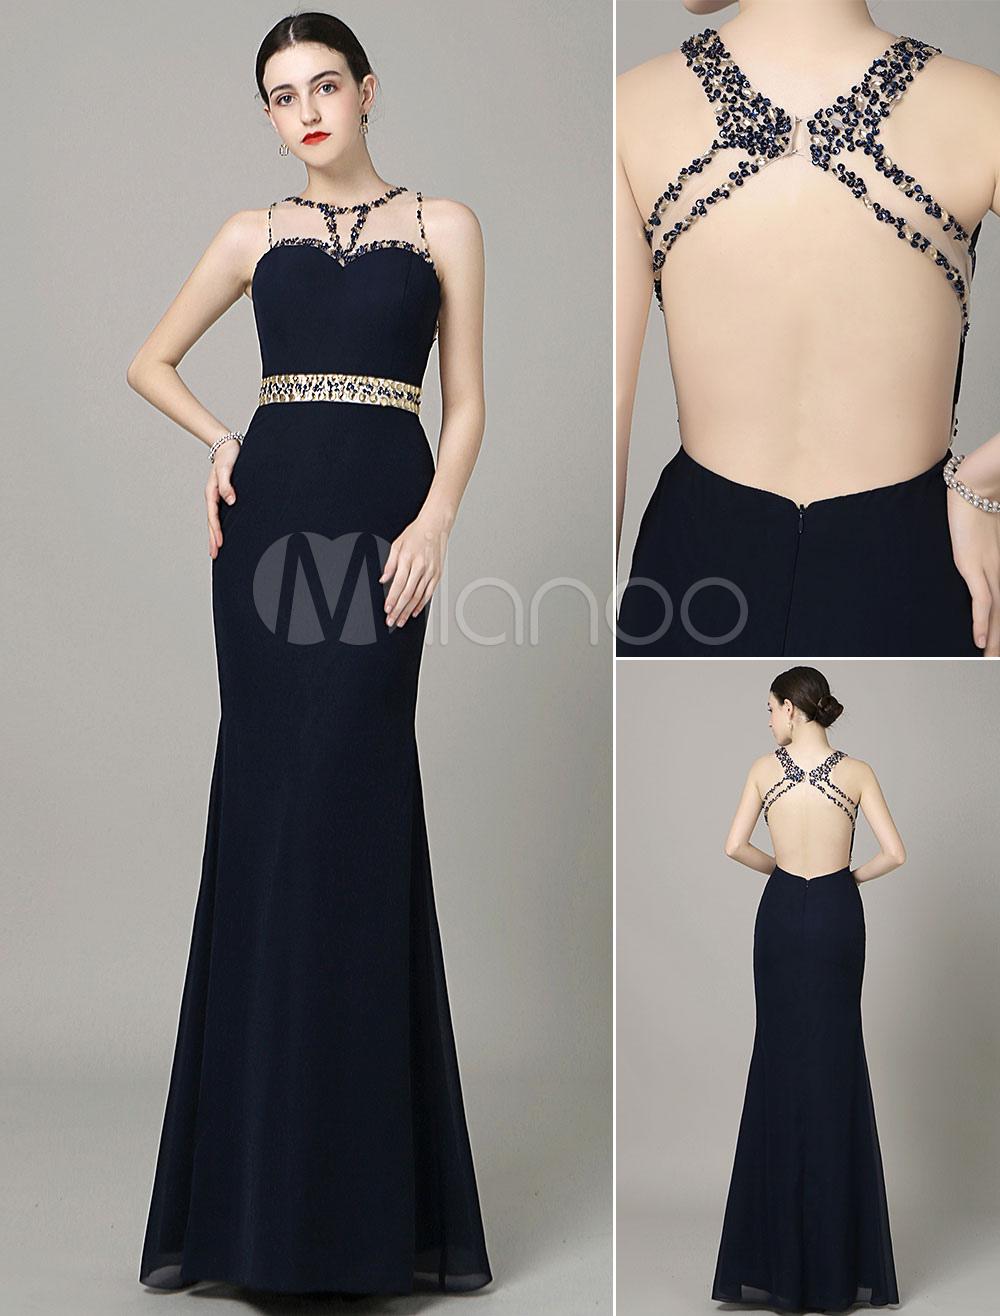 Backless Prom Dress Illusion Neck Cut Out Beading Navy Chiffon Floor-Length Mermaid Evening Dress Milanoo